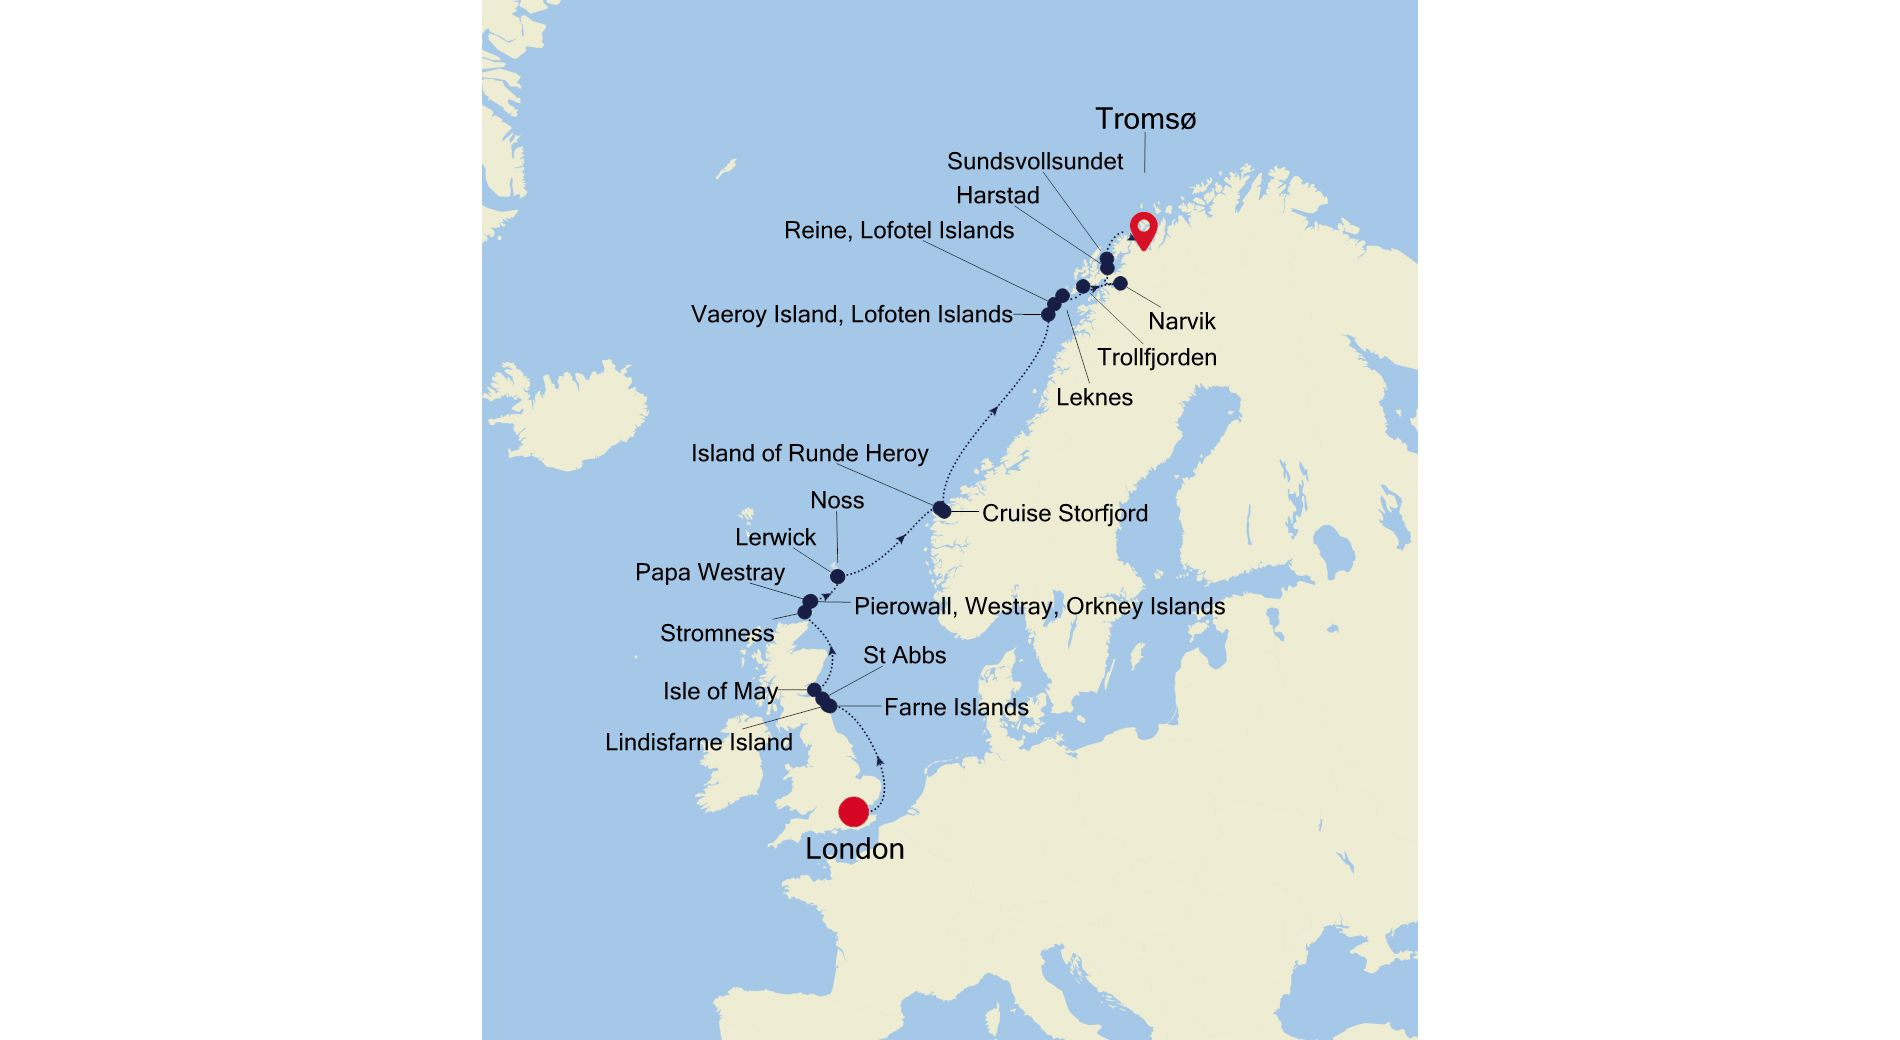 E4210614012 - London to Tromsø